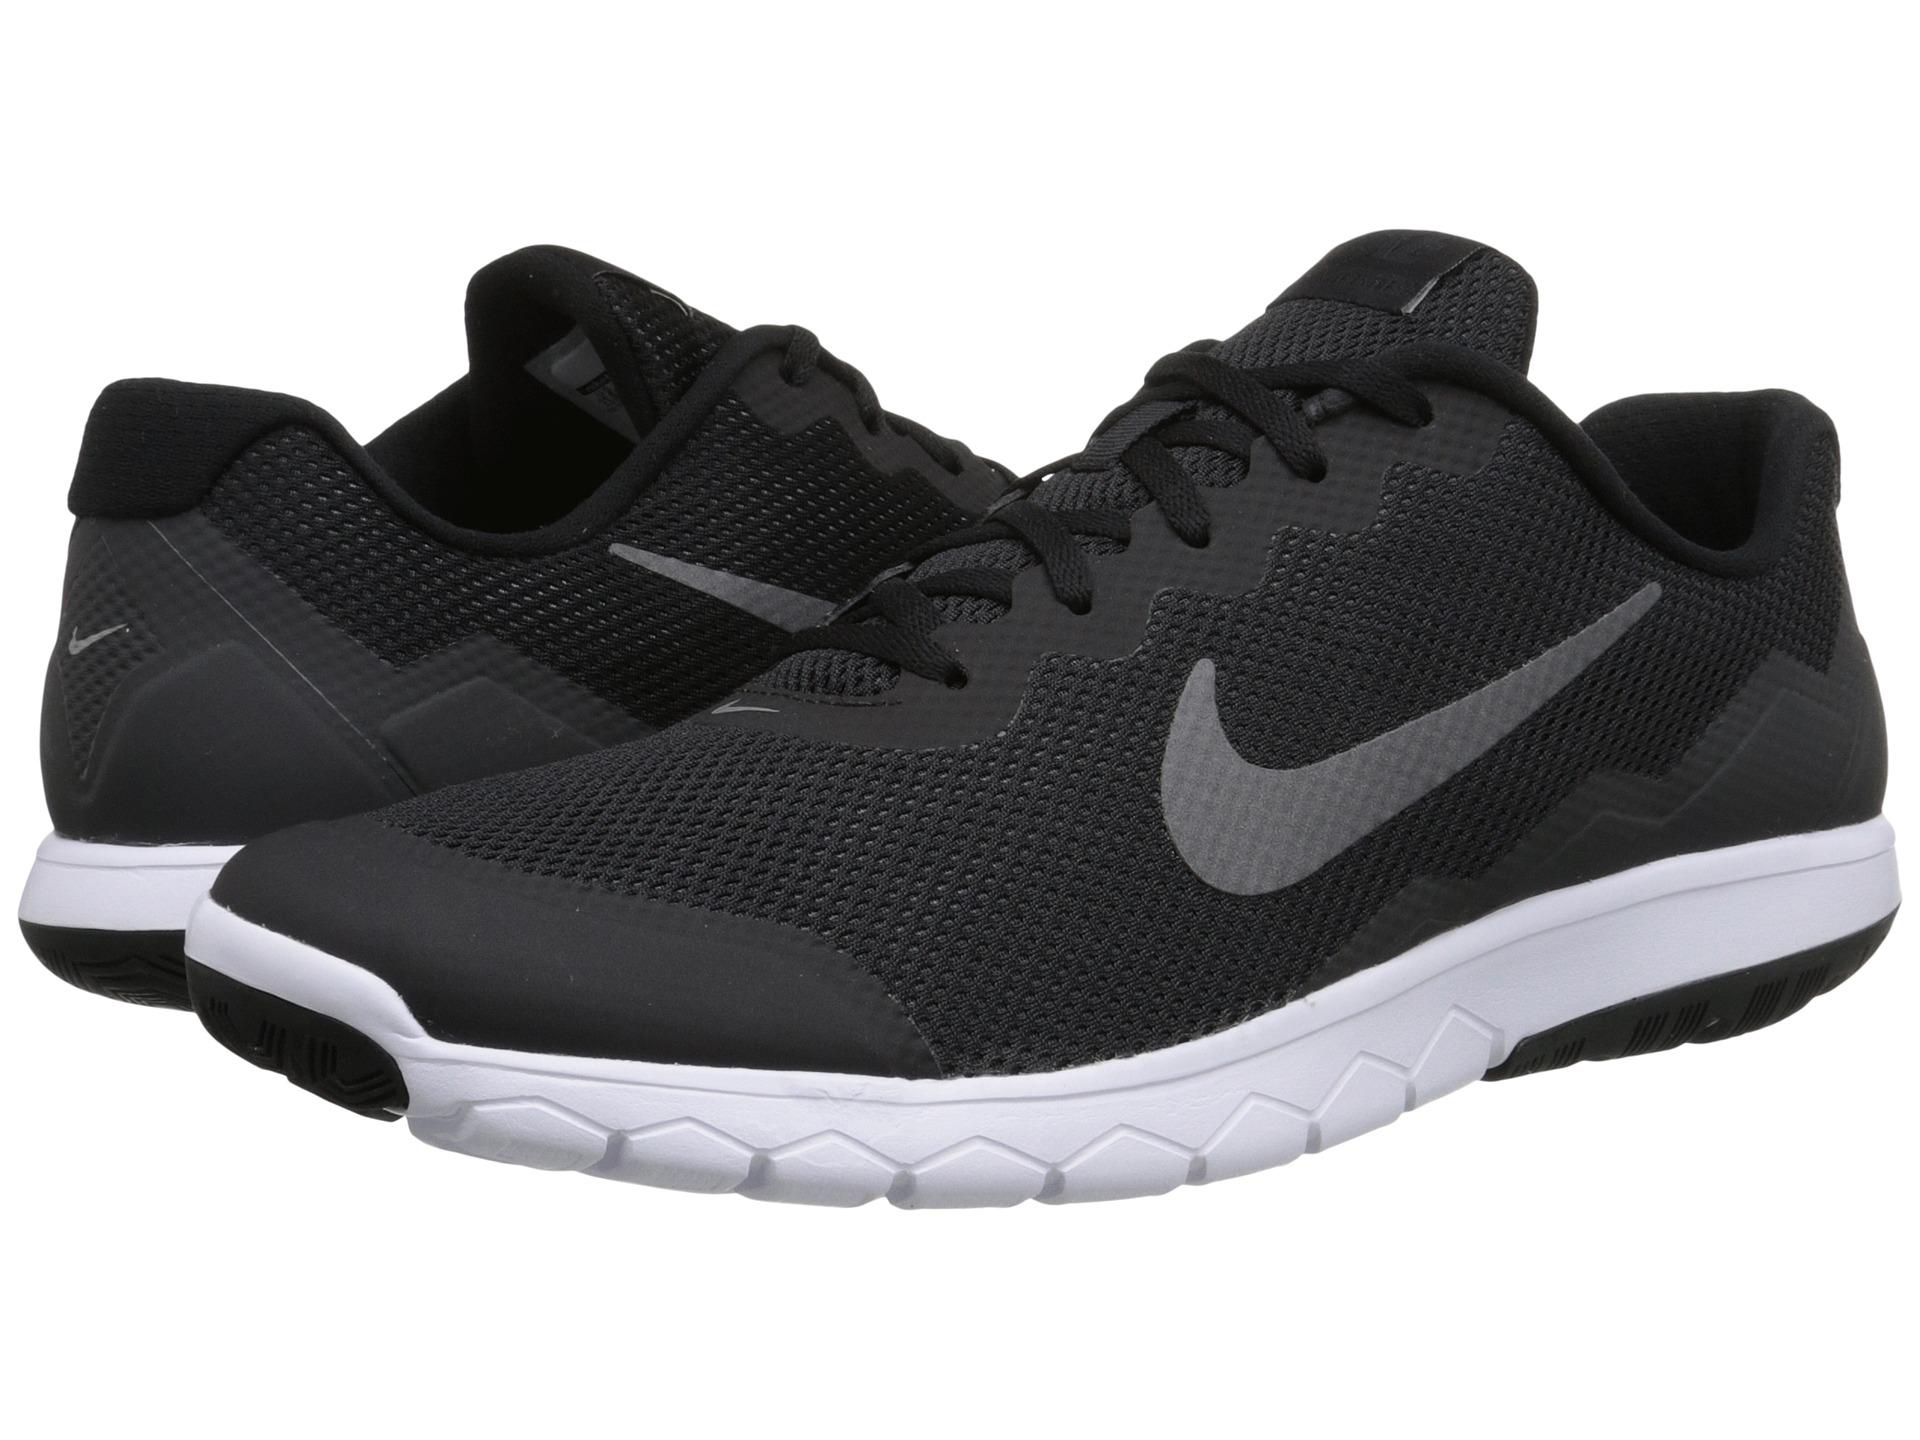 Nike Flex Experience RN Black Anthracite White